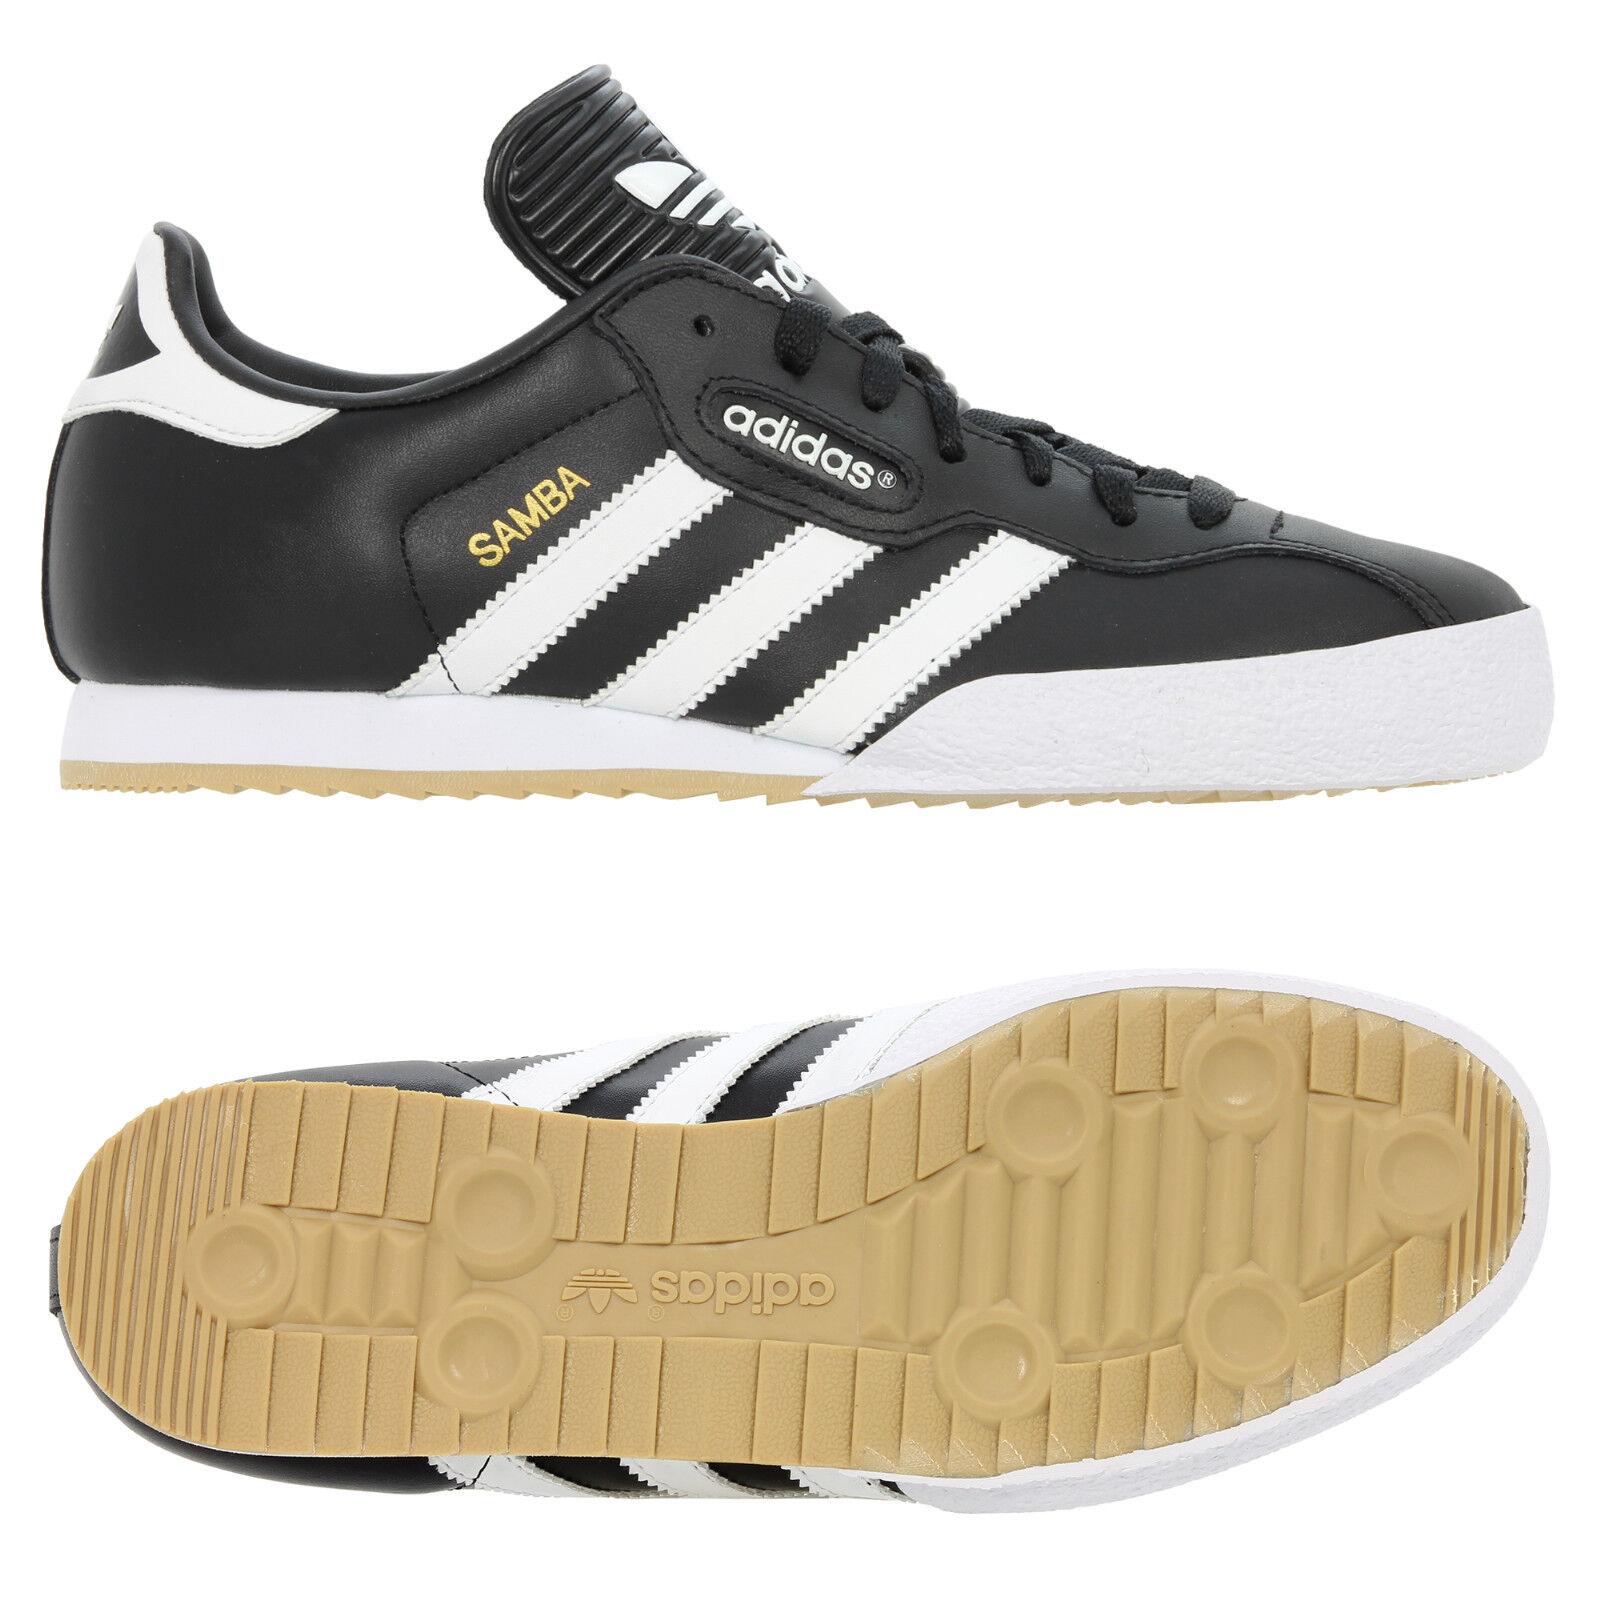 Adidas Originale Mens Samba Super UK Größe 7-8-9 10 11 12 Turnschuhe NEU